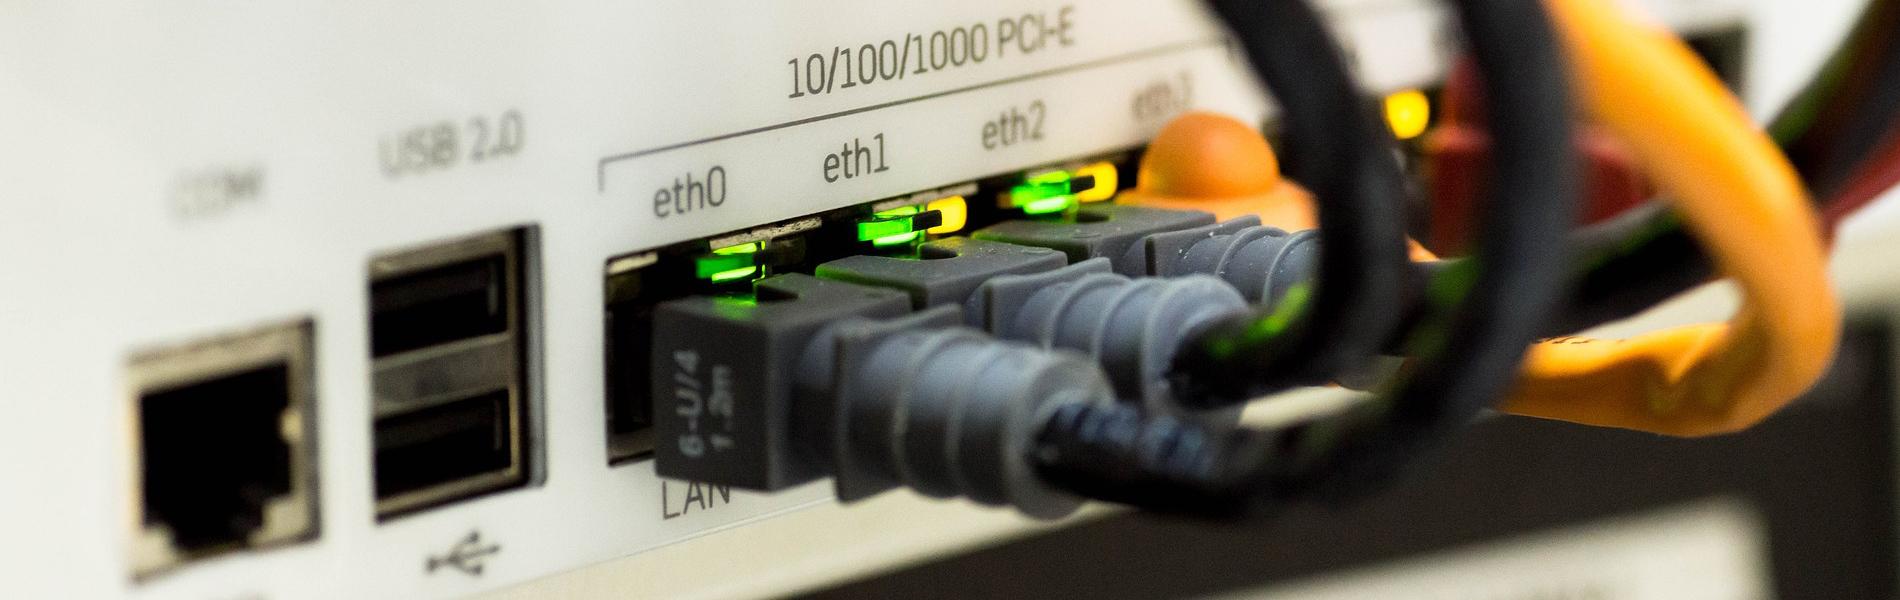 Kompleksowa obsługa sieci komputerowych